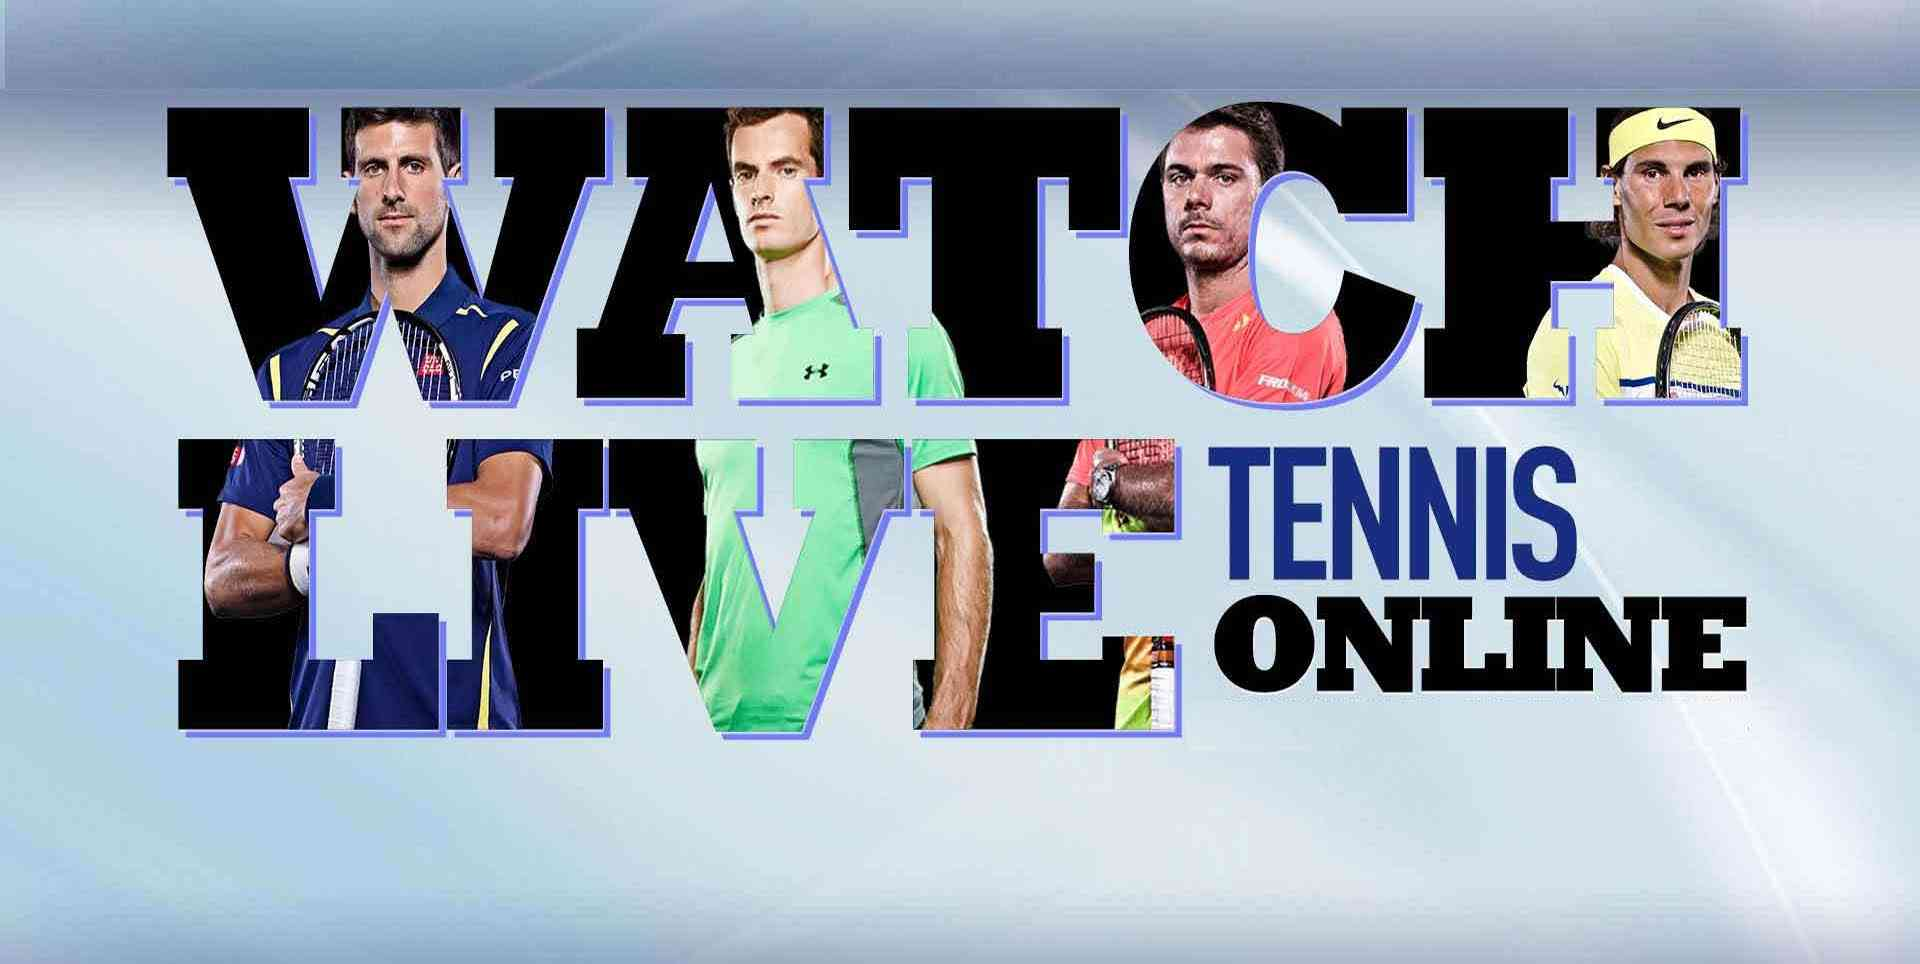 watch-j.-isner-vs-m.-baghdatis-mens-singles-quarterfinals-online-2013